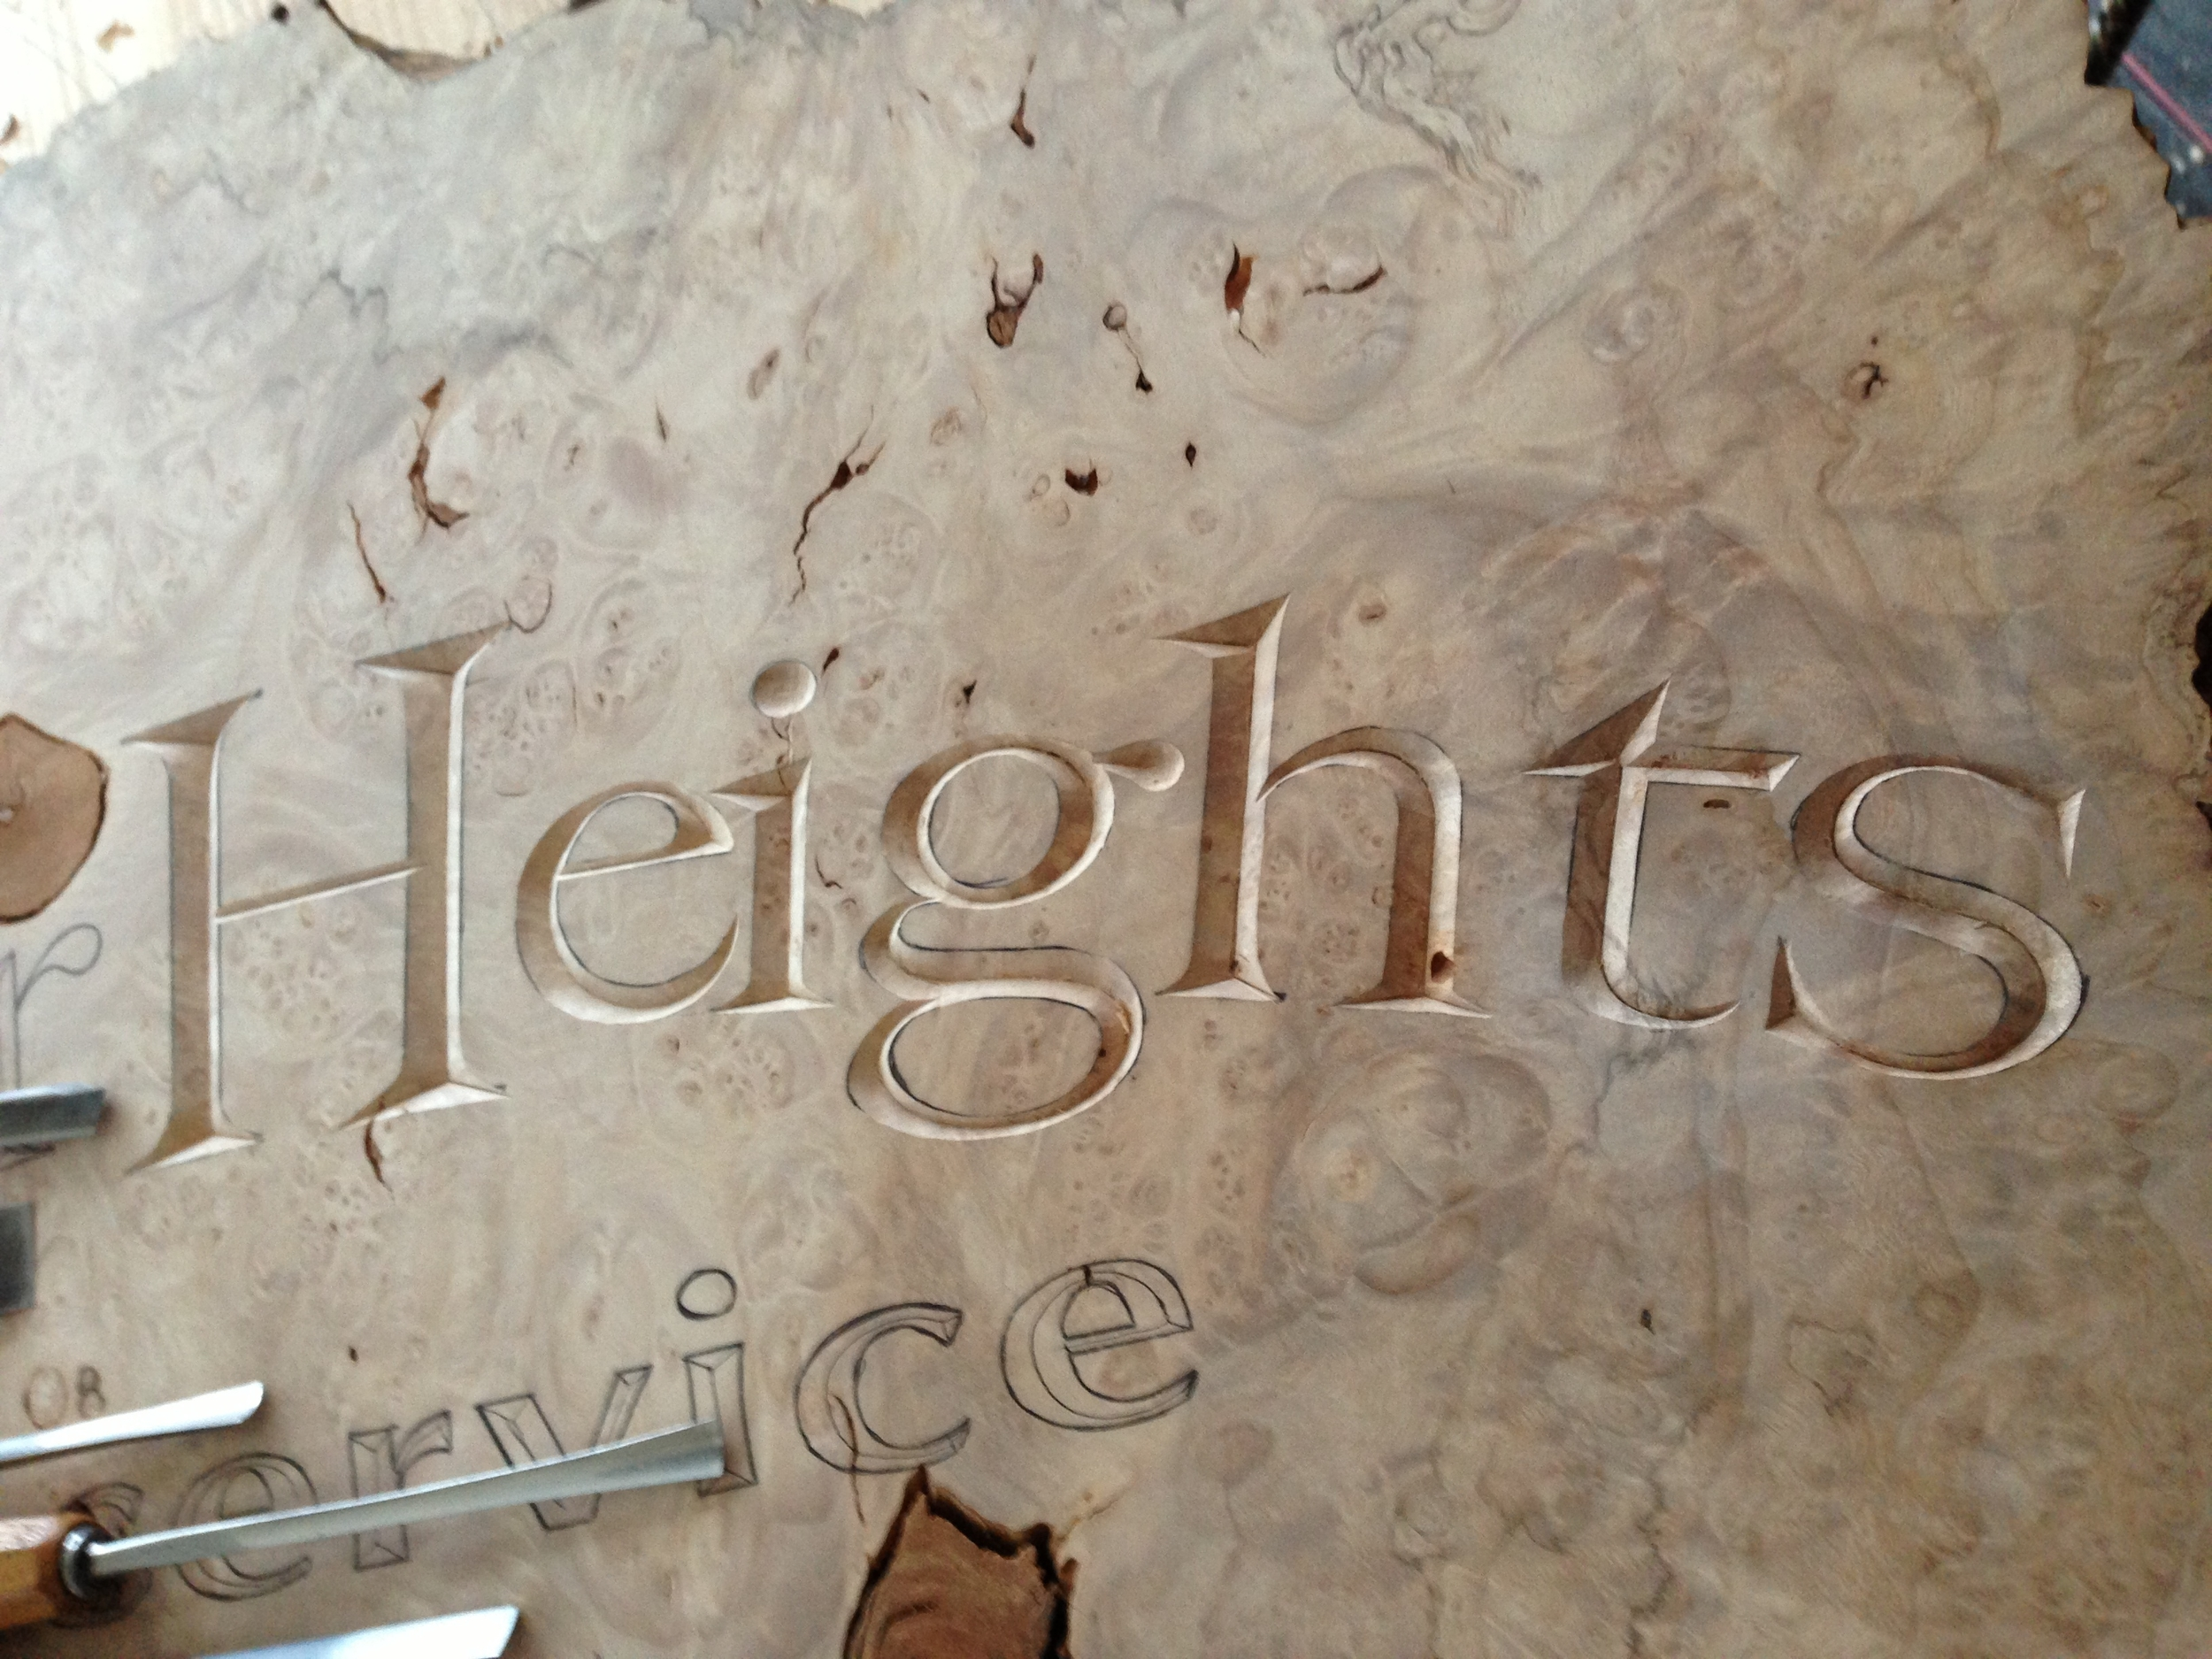 Letter carving